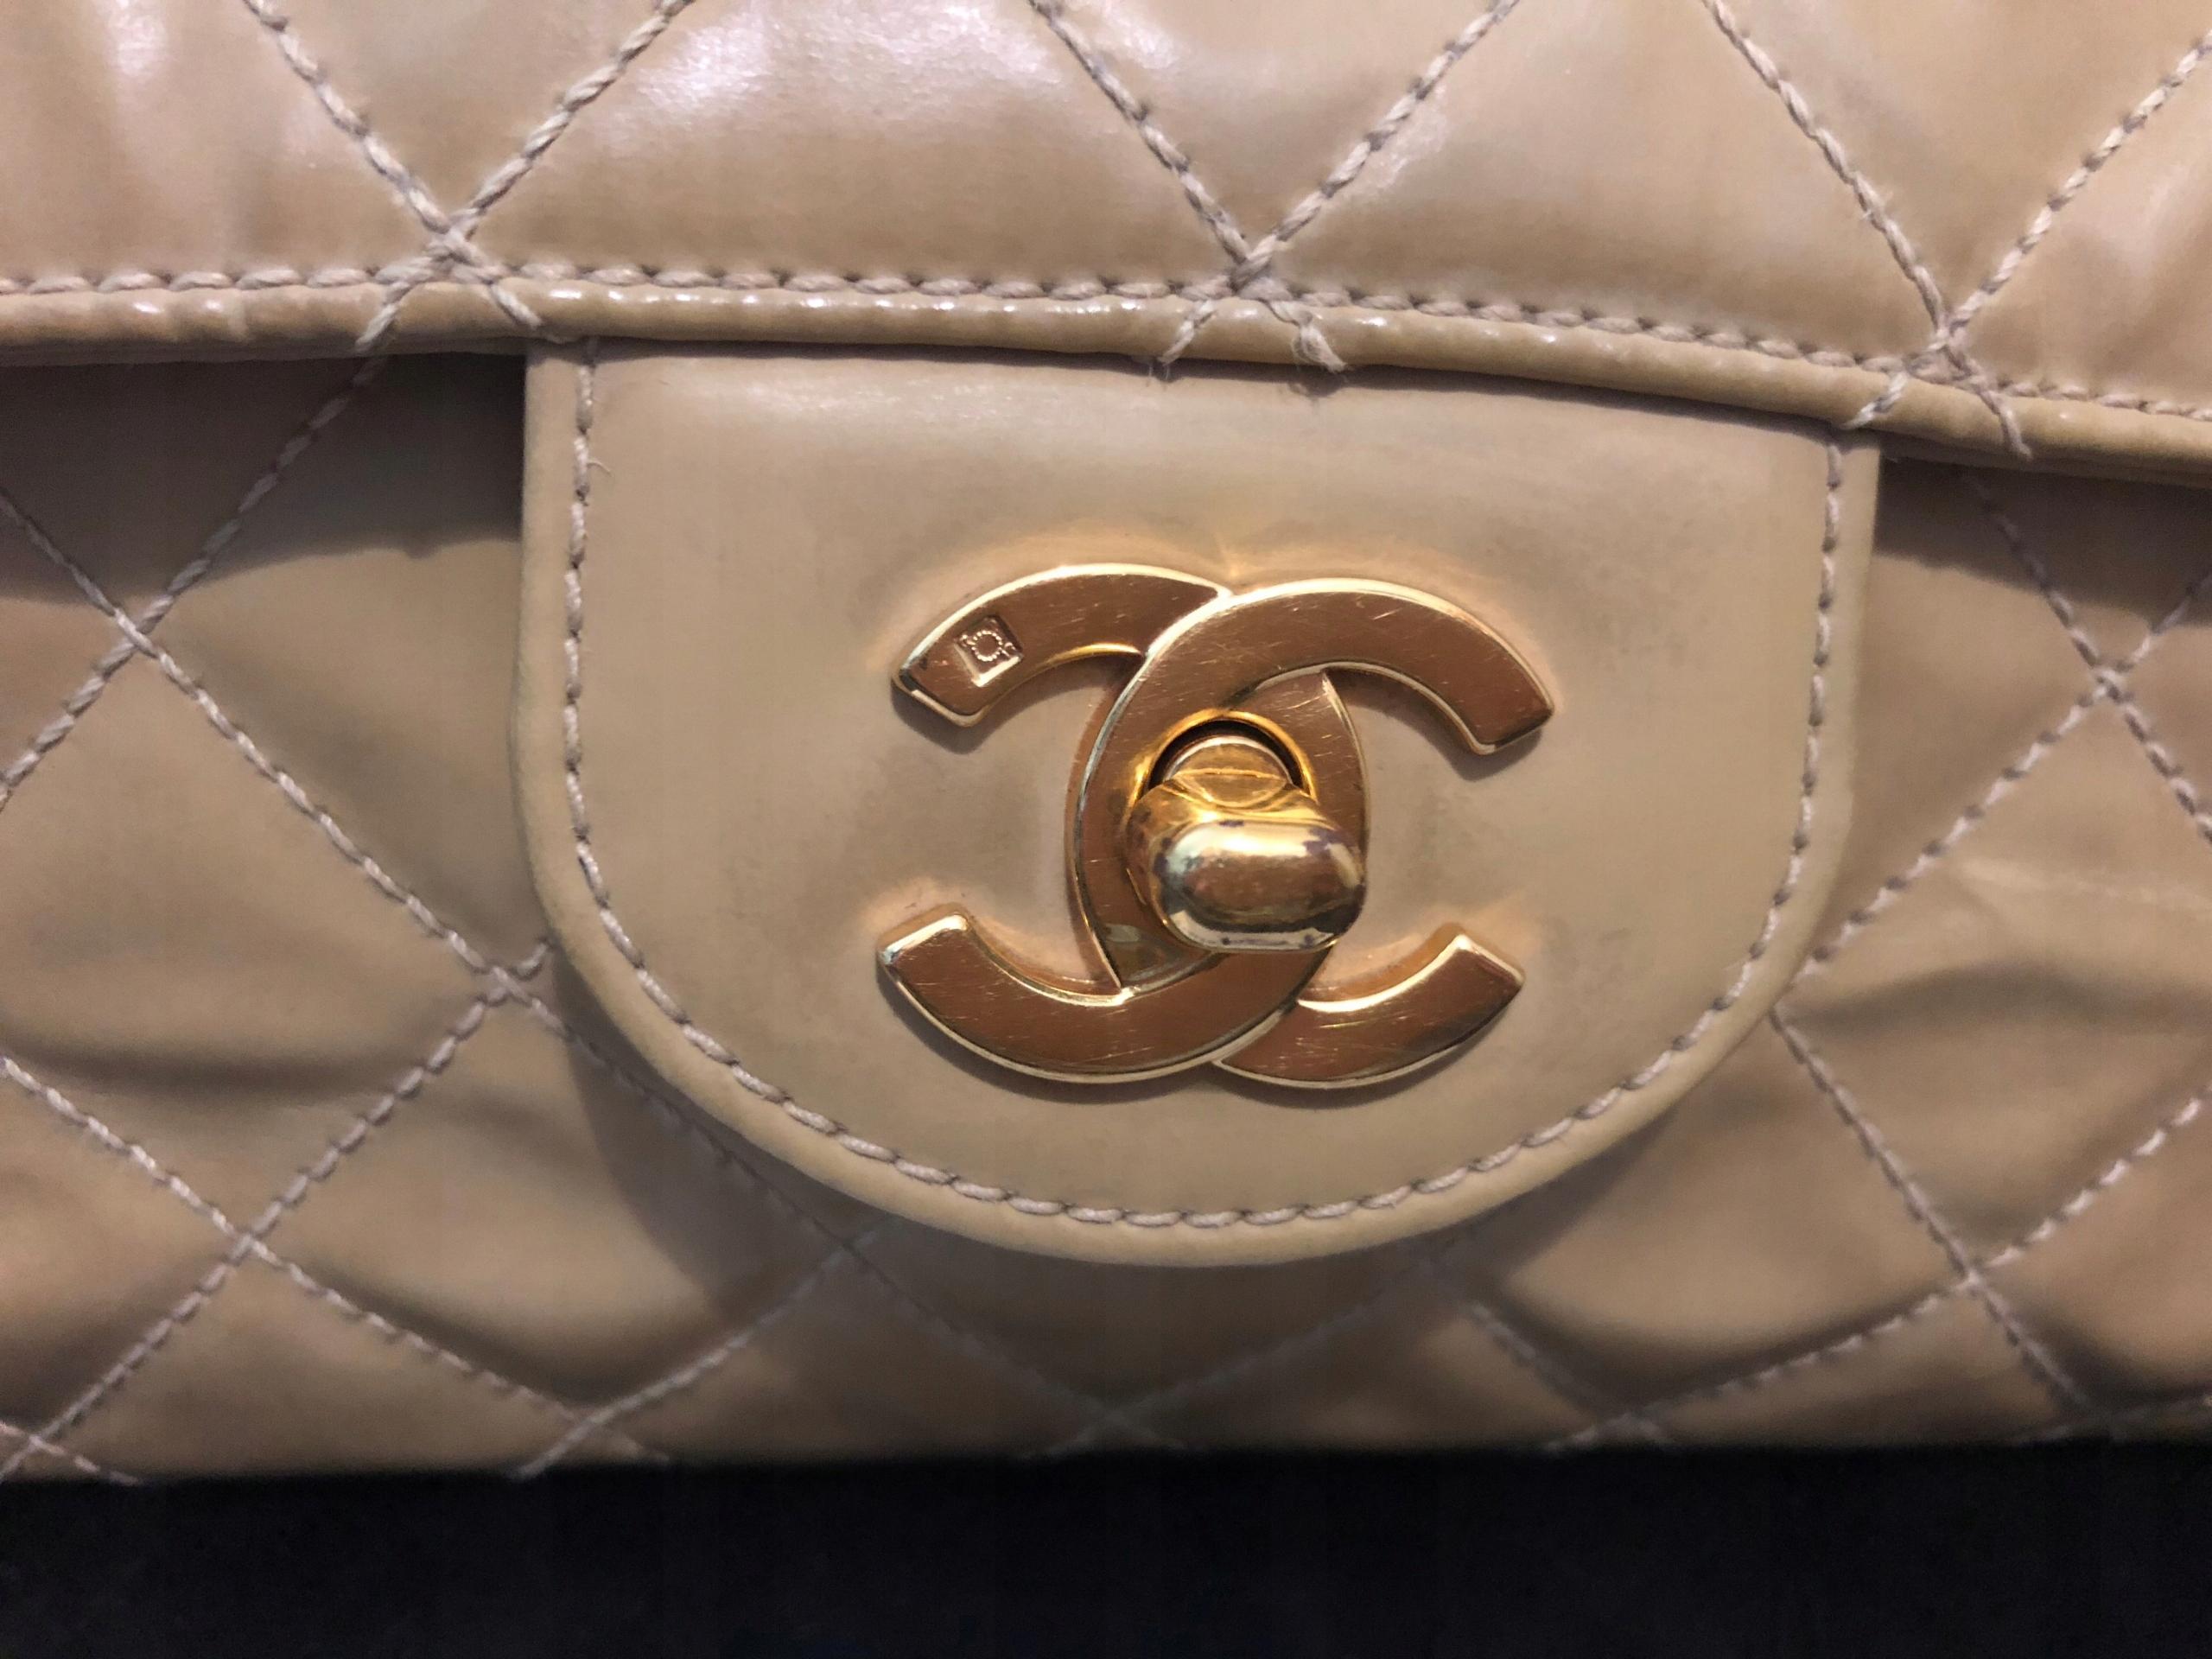 594191490a938 Torebka Chanel 2.55 Medium vintage oryginalna - 7519000972 ...